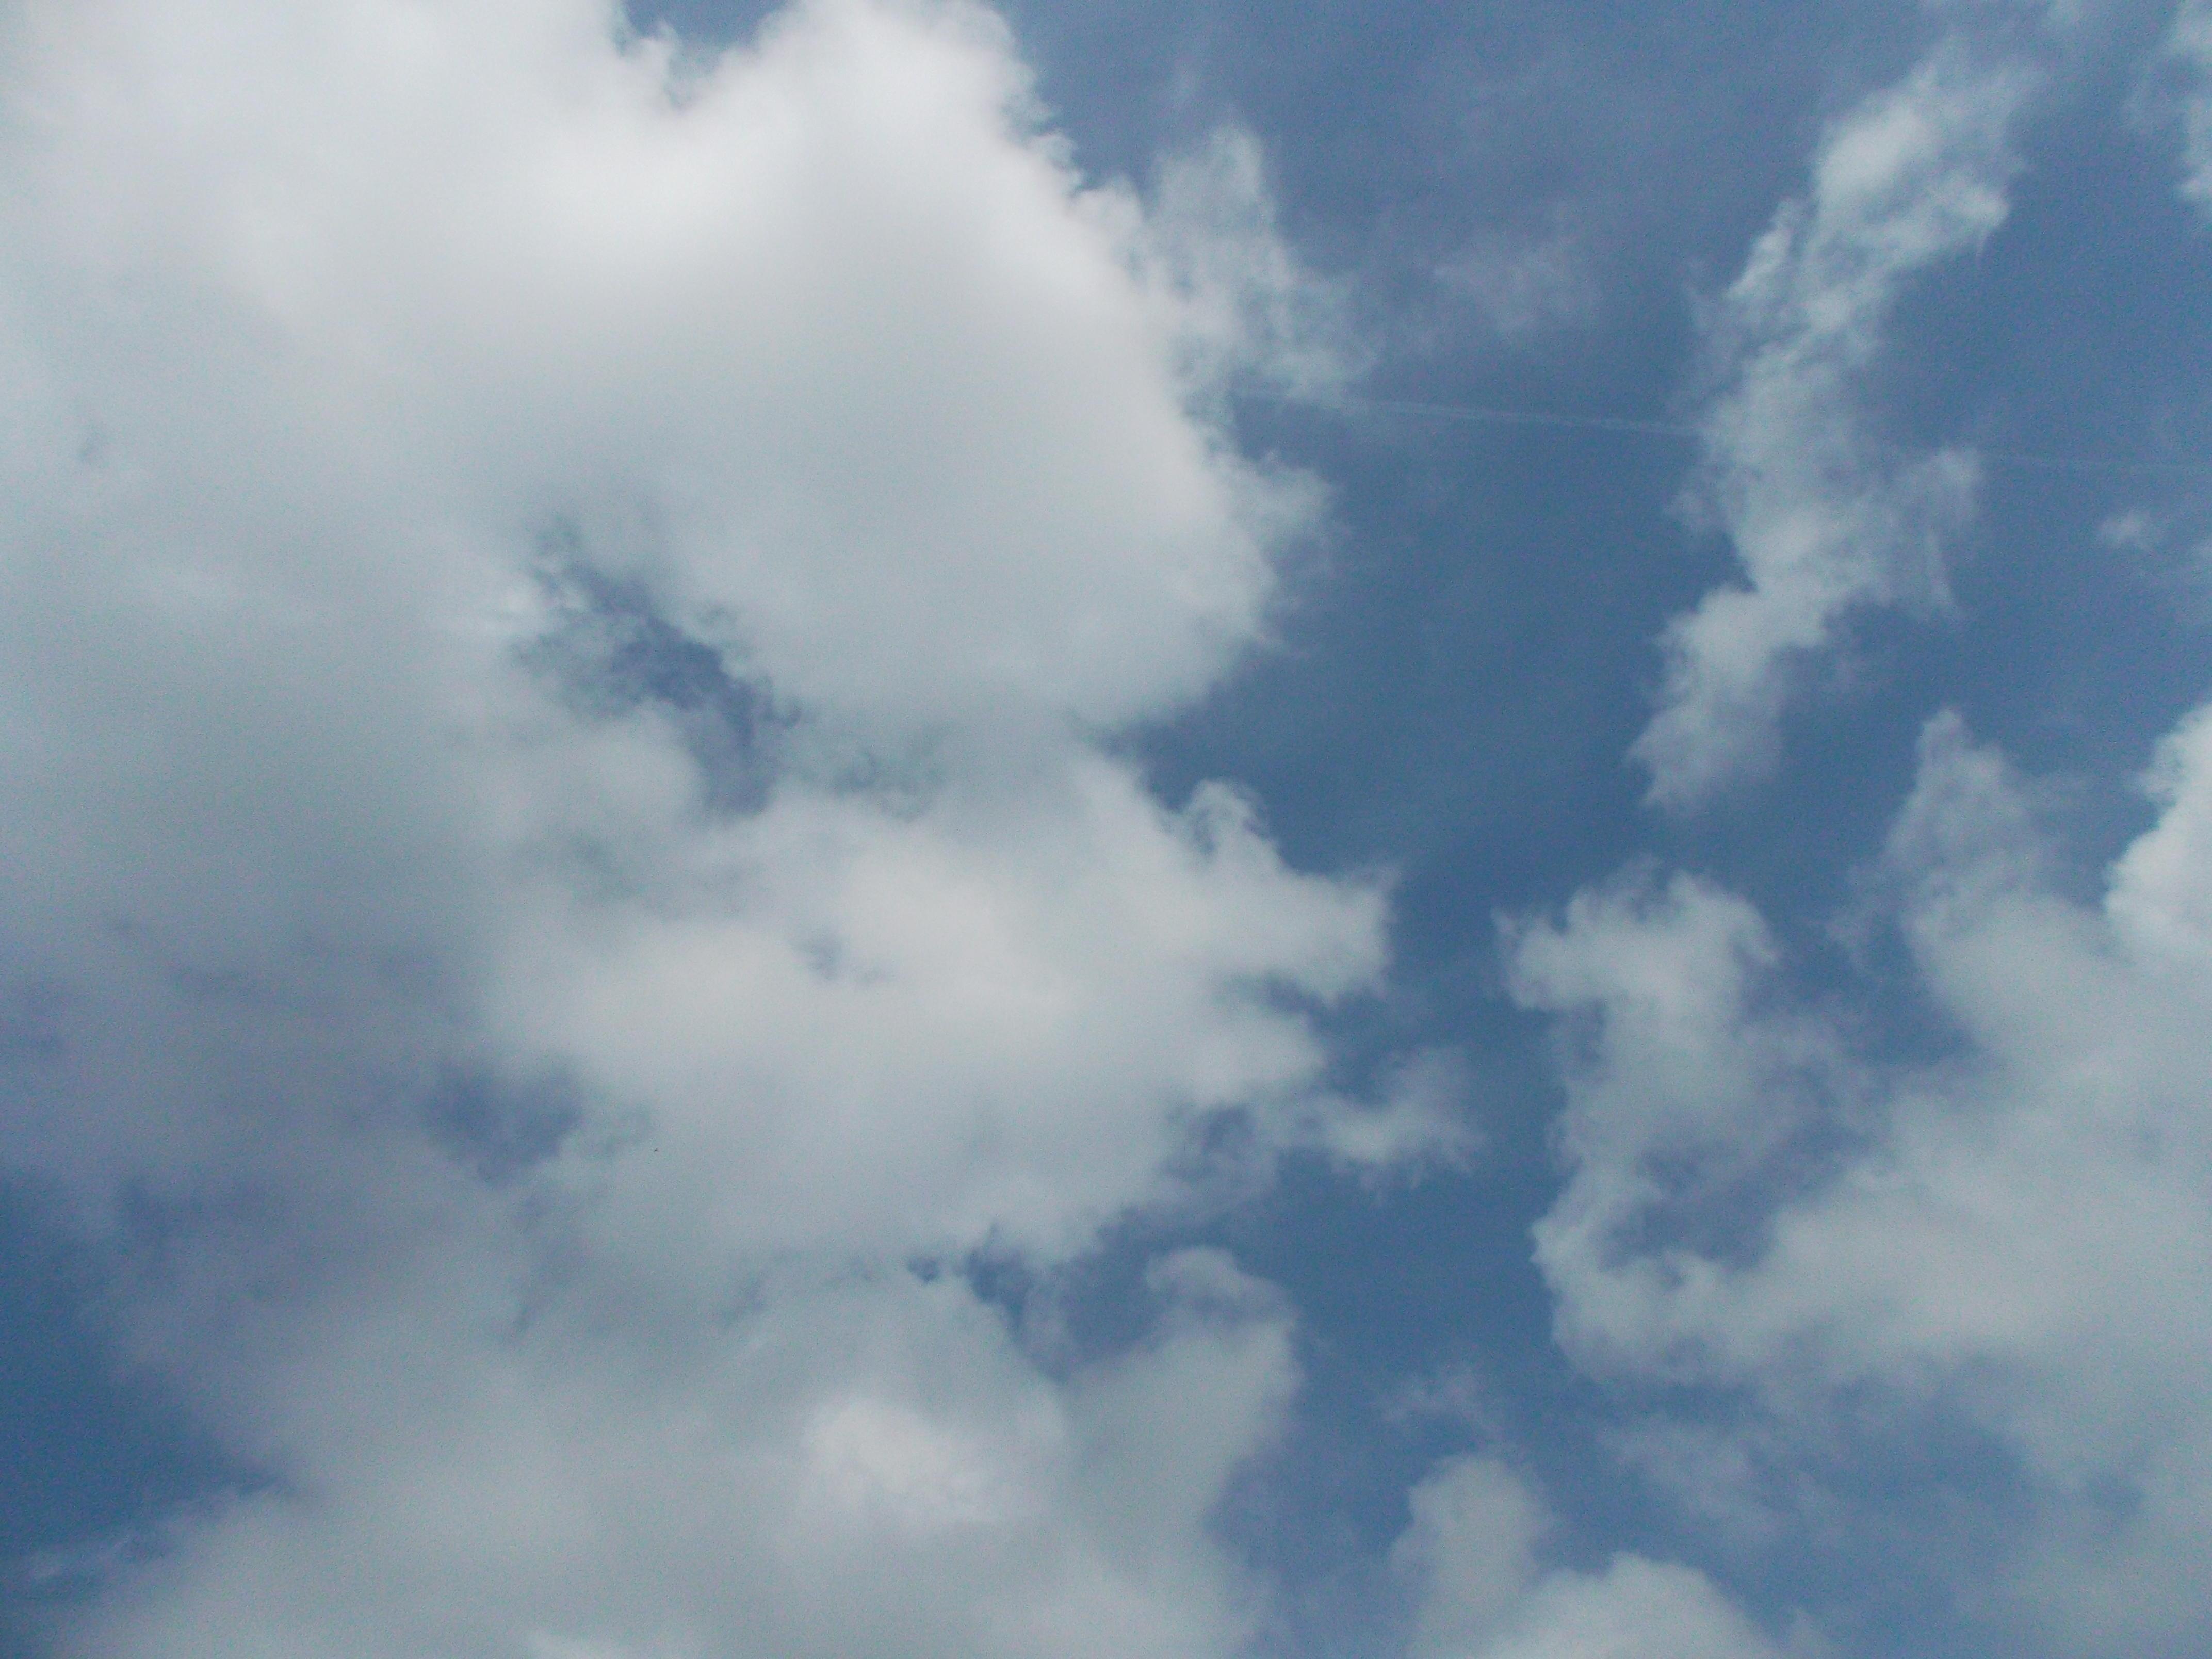 2013-04-07 Longitude -0.371 Latitude 49.182 Altitude 29 Heure 12h28